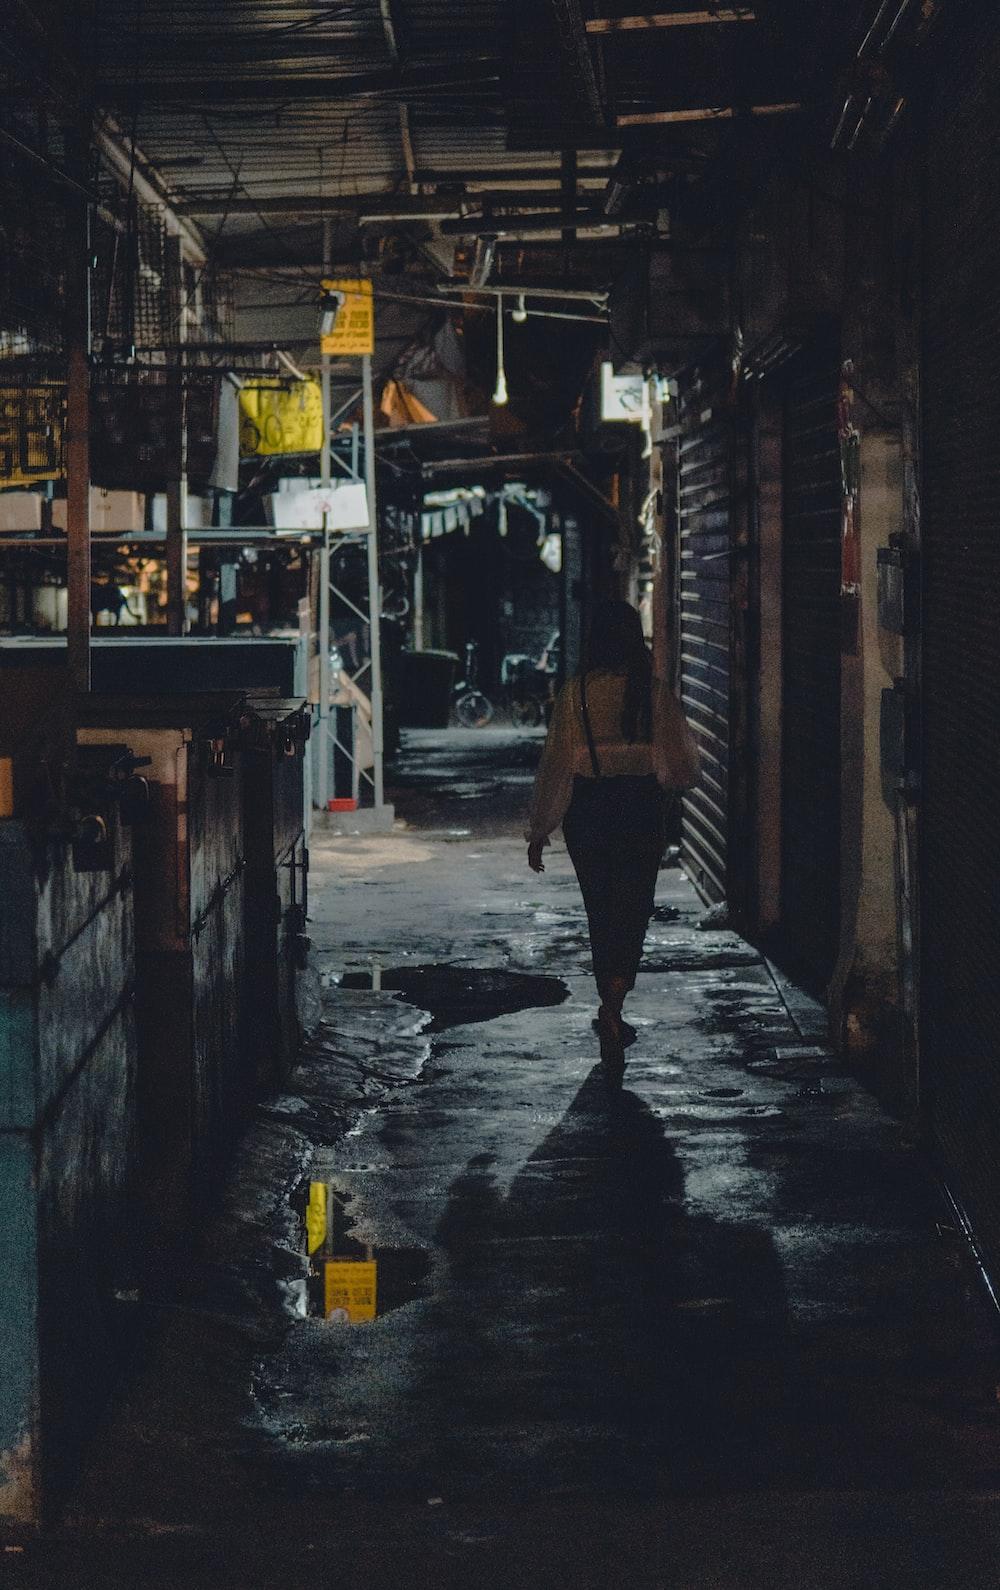 woman in black tank top and black skirt walking on sidewalk during night time